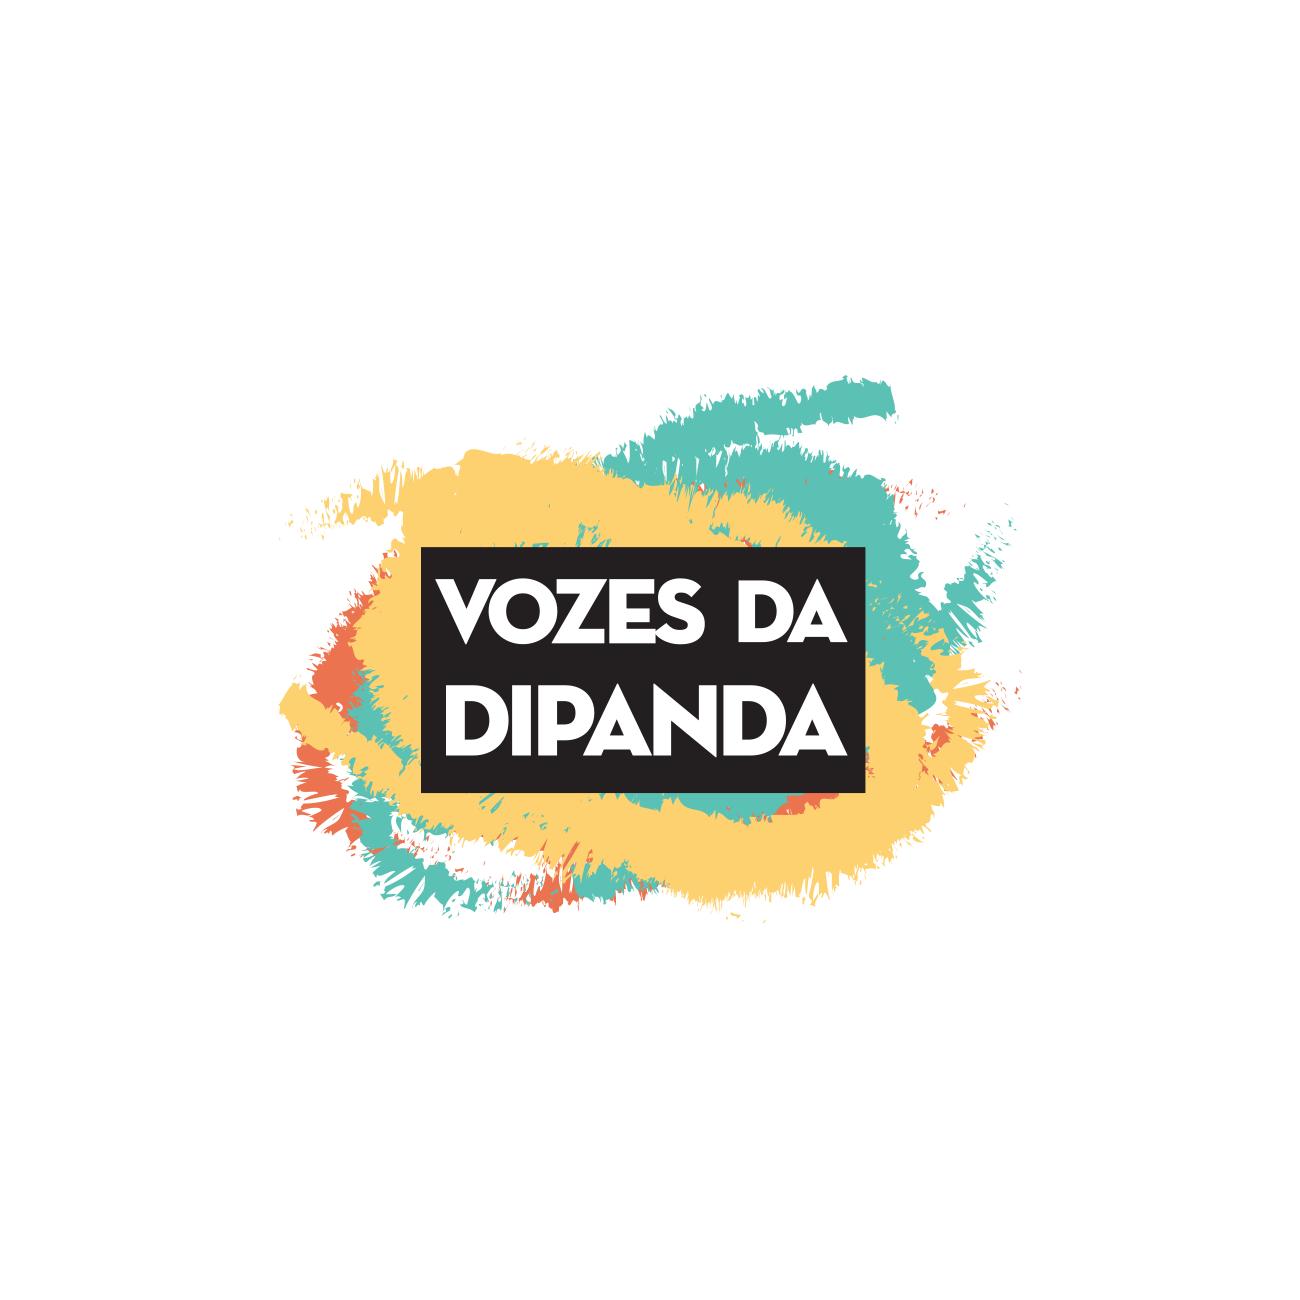 logotipo vozesdipanda